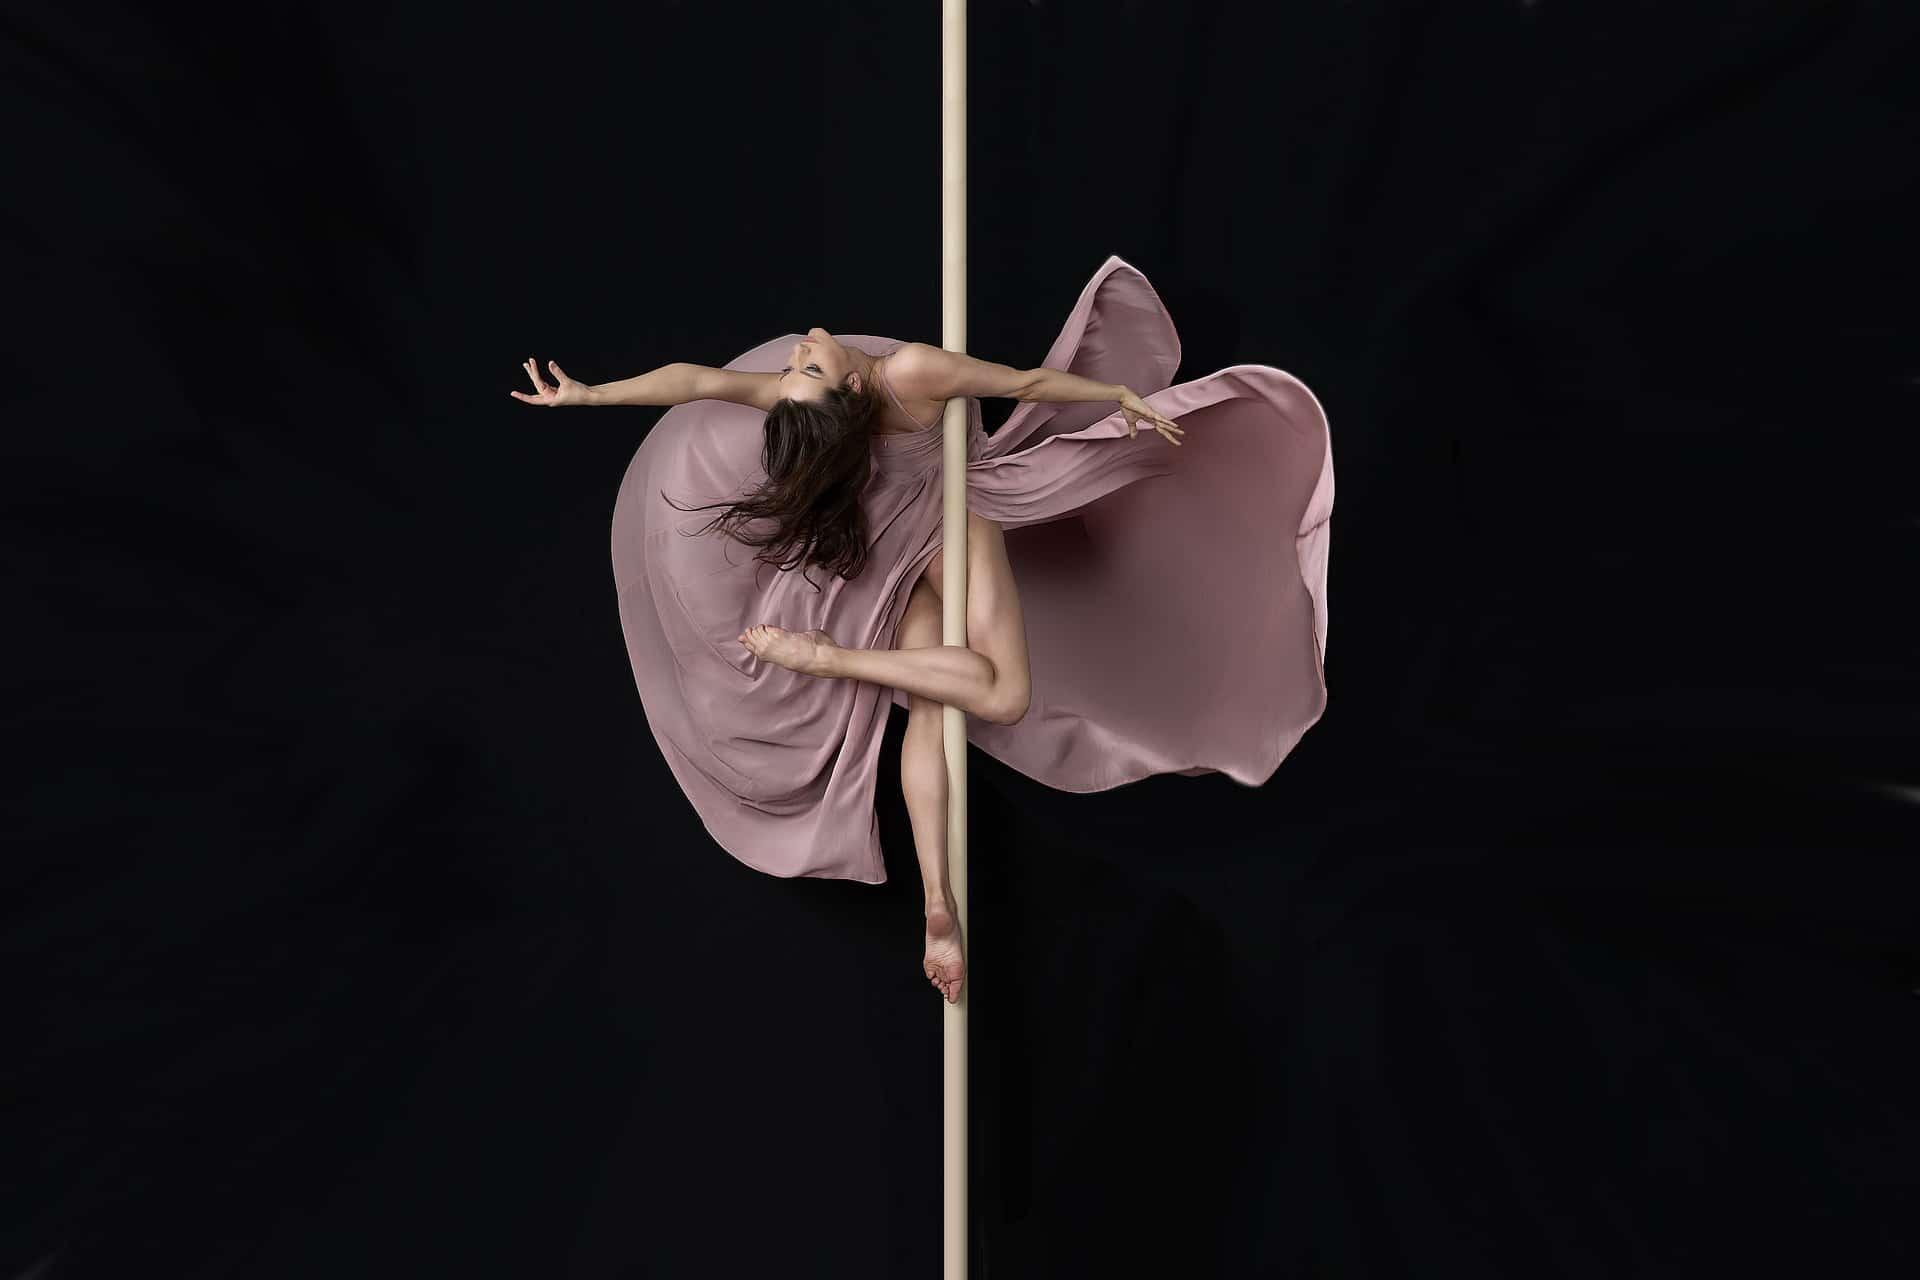 Impulse – Beats, Dance & Bodyart. Die neue Show im GOP Varieté-Theater Bonn